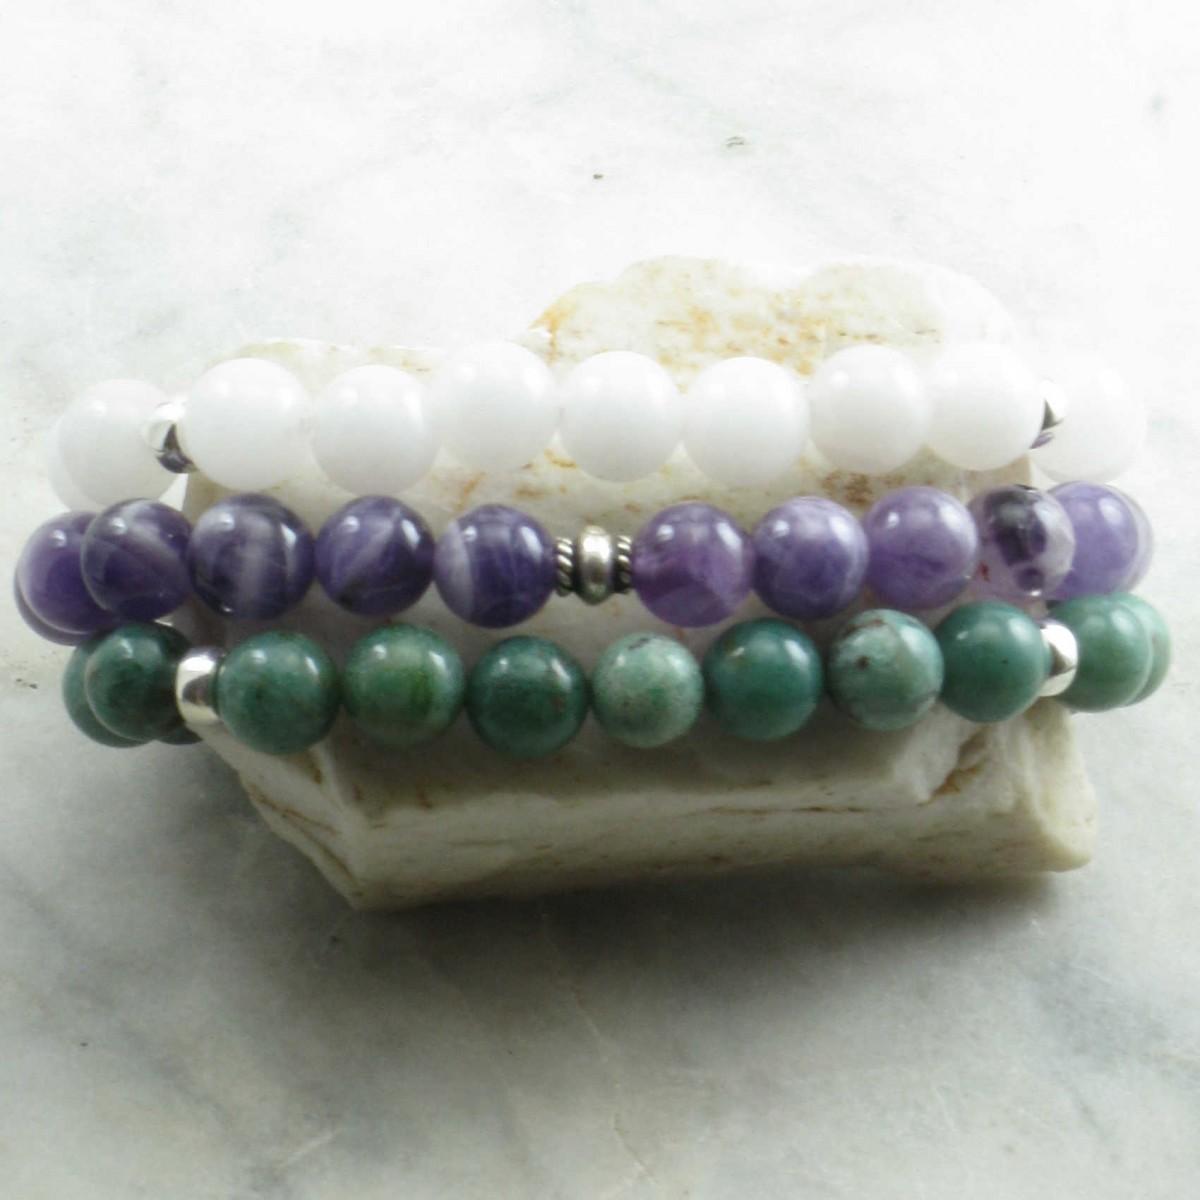 Custom_Mala_Stack_White_Quartz_Amethyst_Jade_Mala_Beads